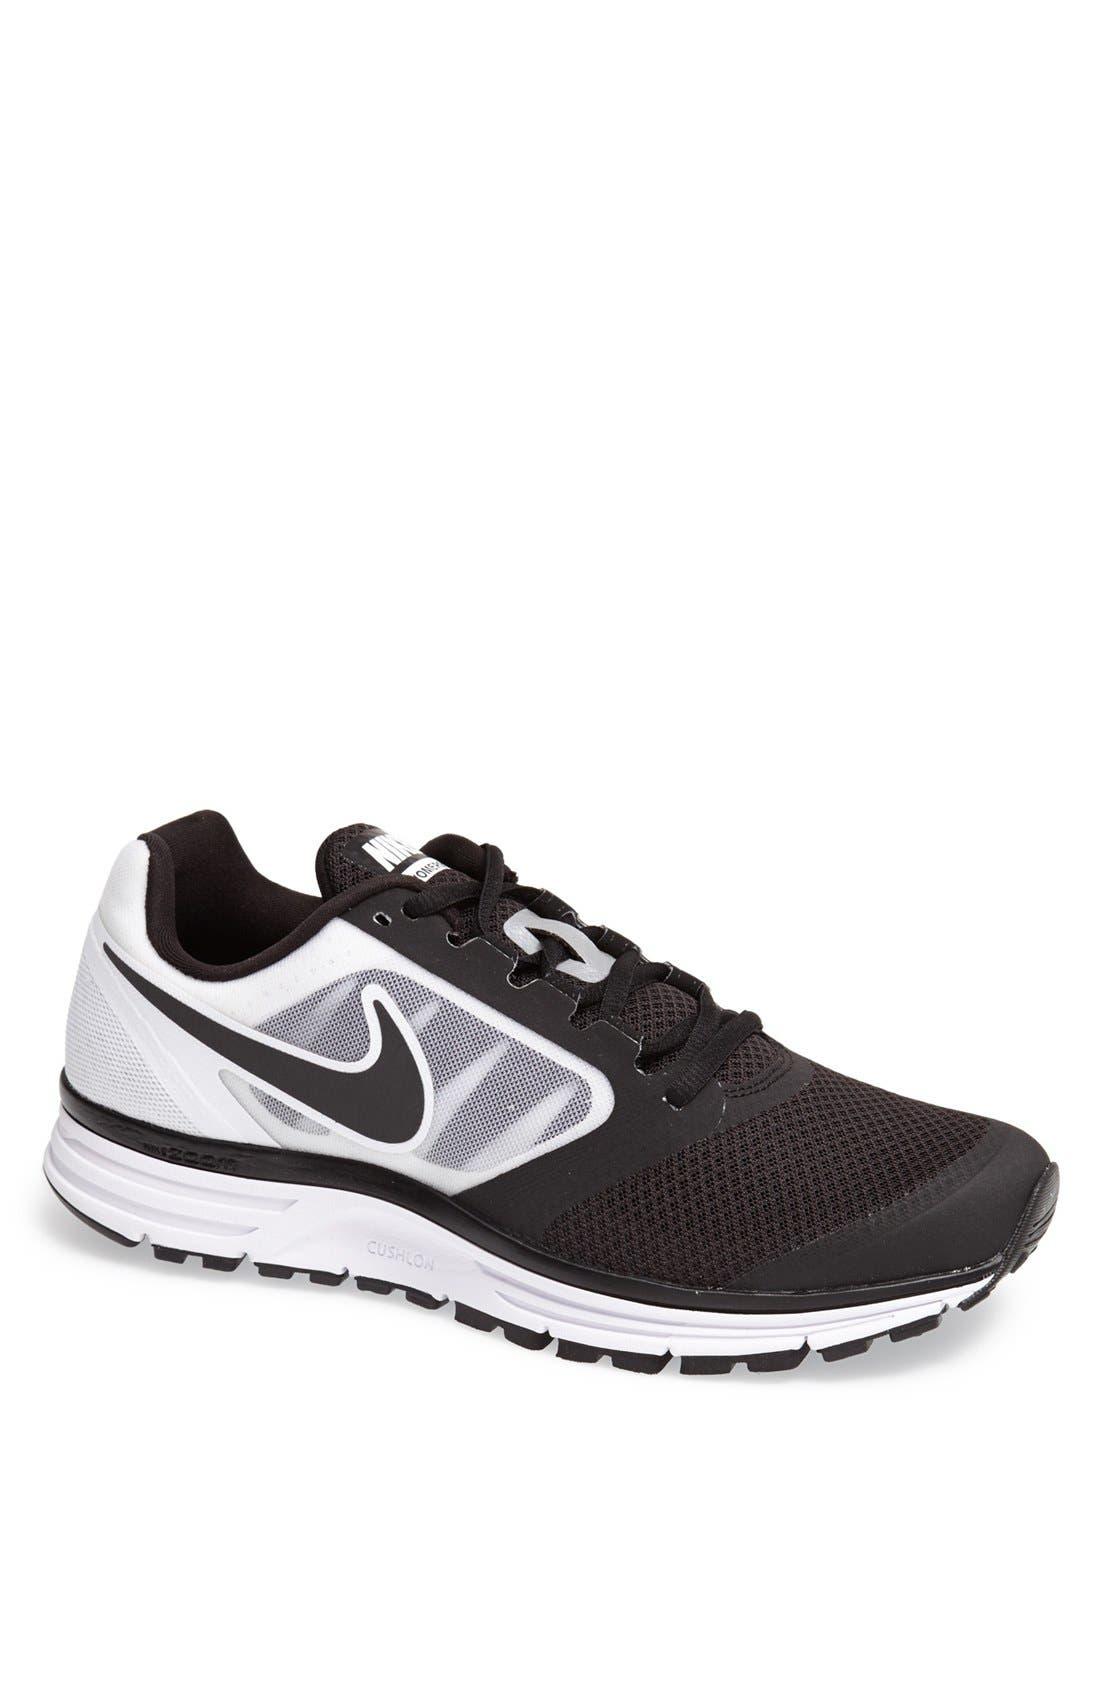 Alternate Image 1 Selected - Nike 'Zoom Vomero+ 8' Running Shoe (Men)